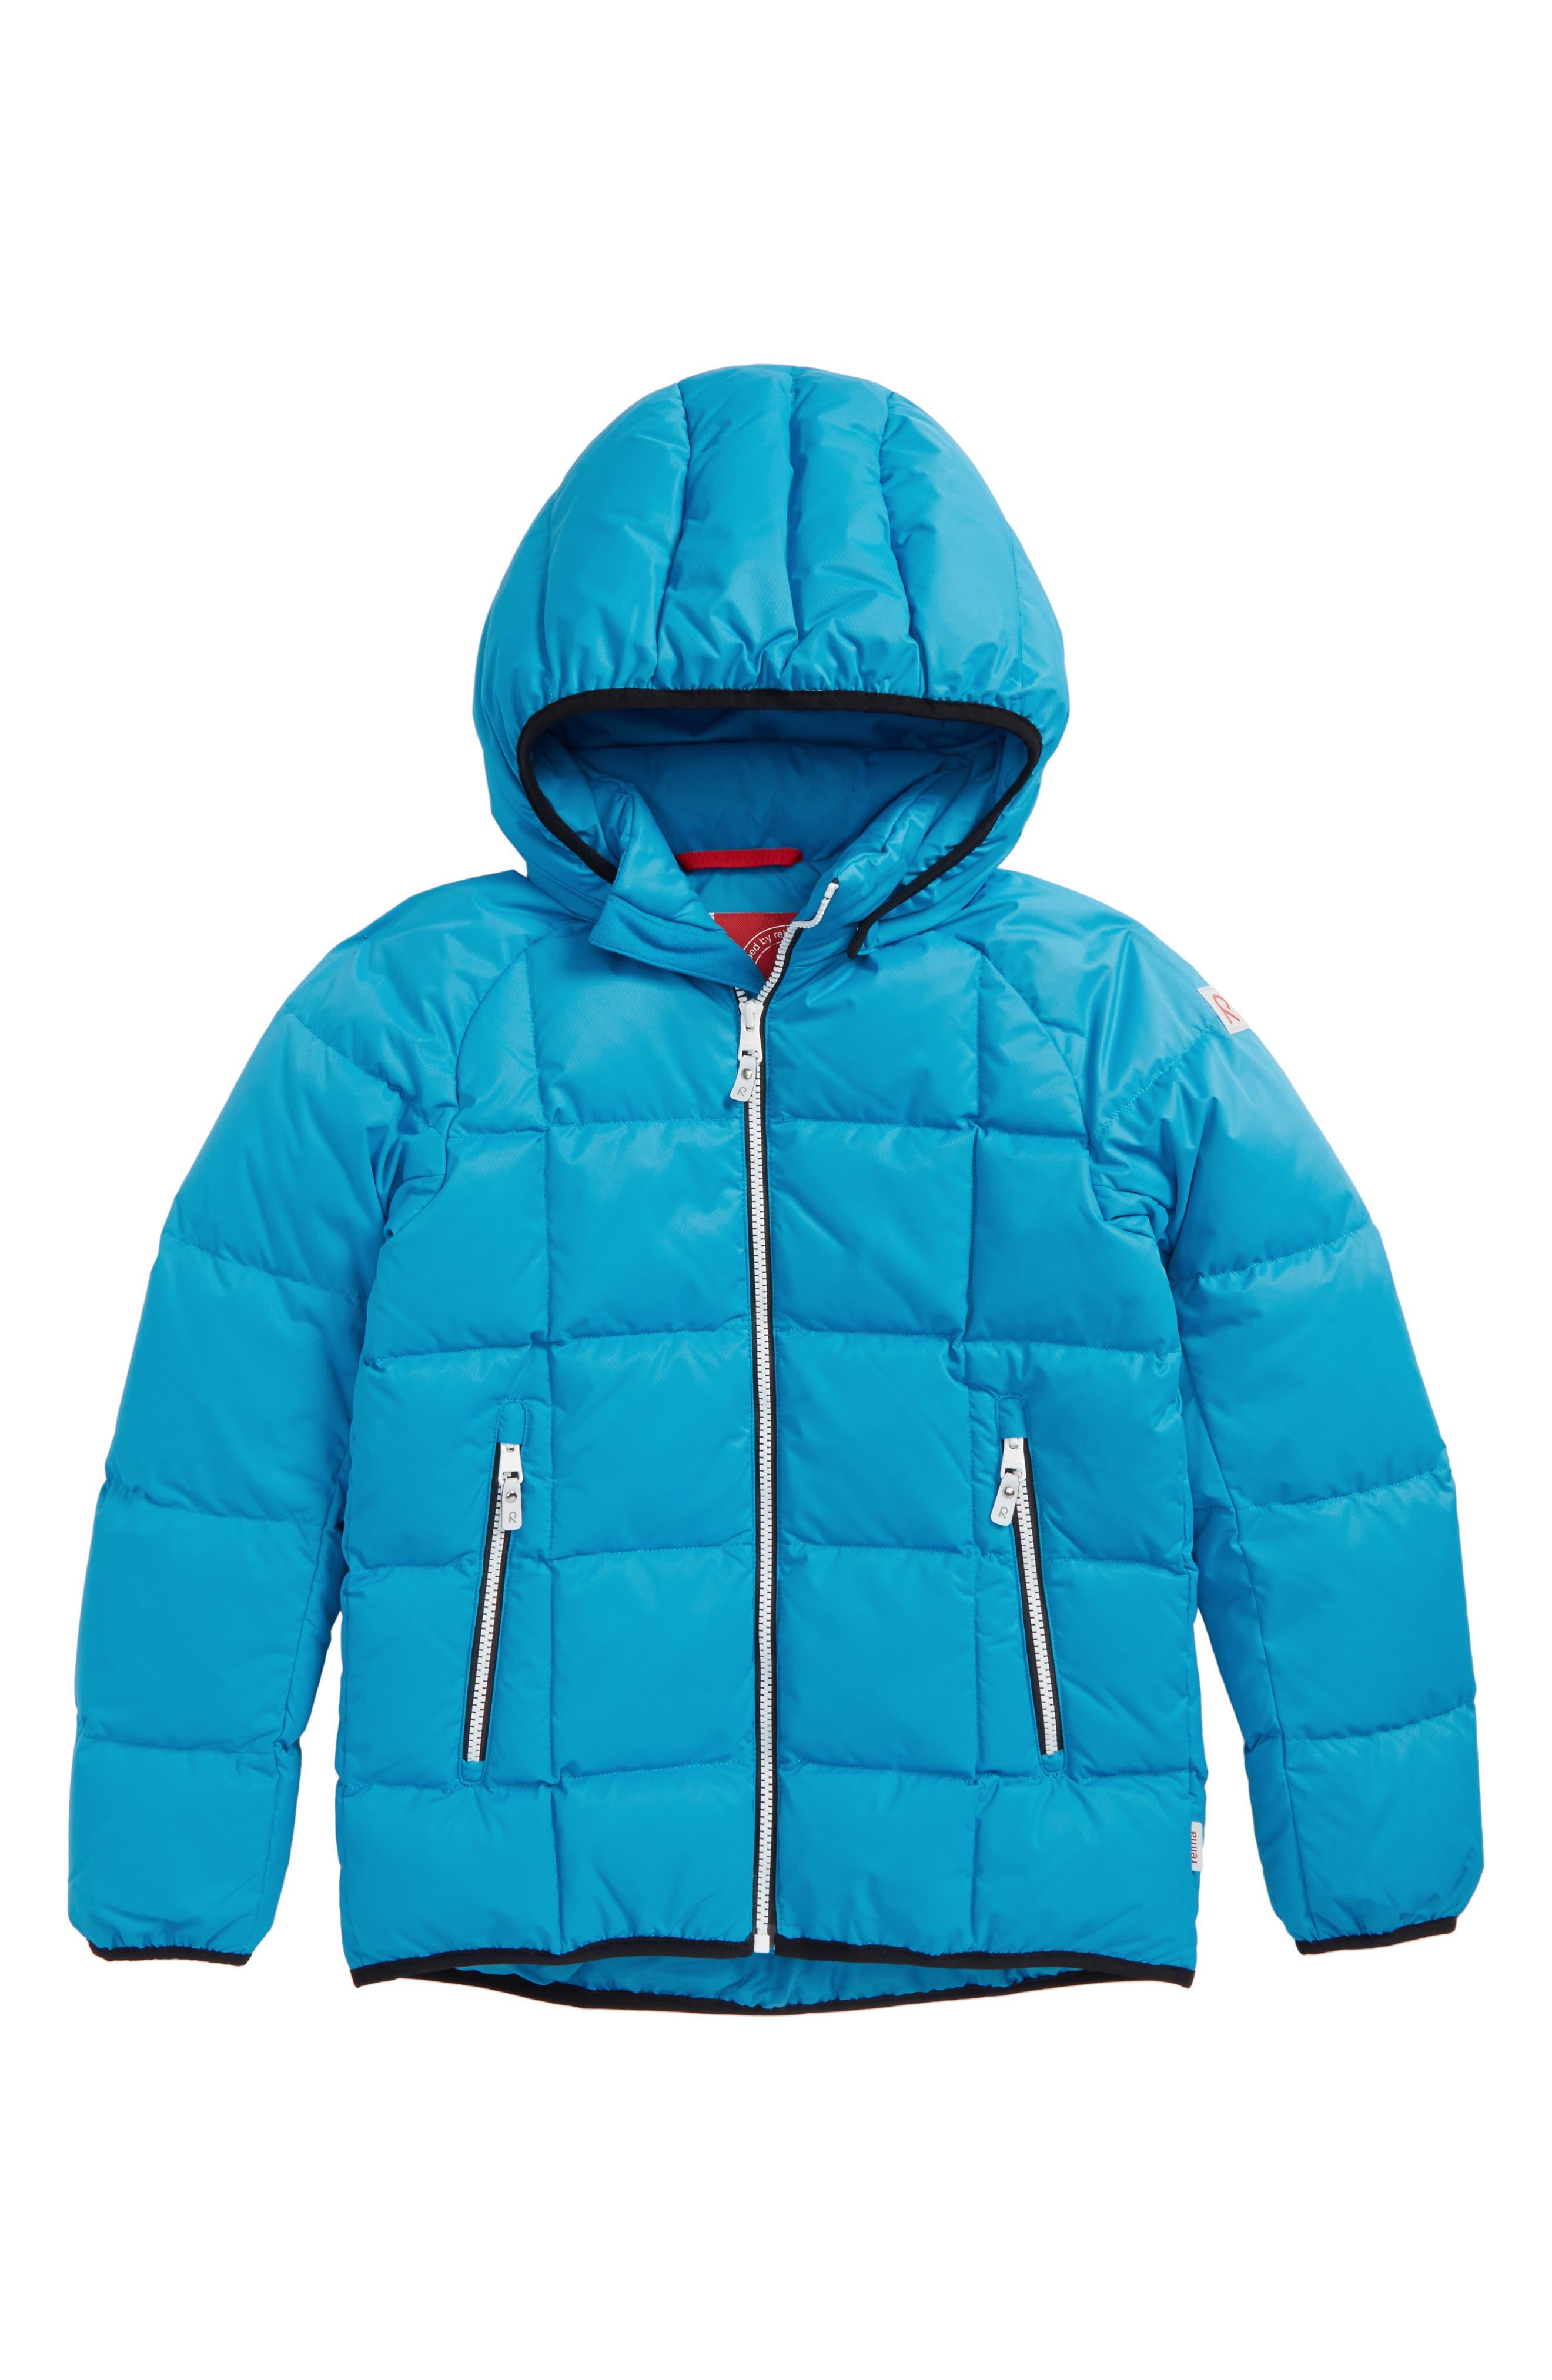 Jord Down Waterproof Insulated Coat,                         Main,                         color, 400